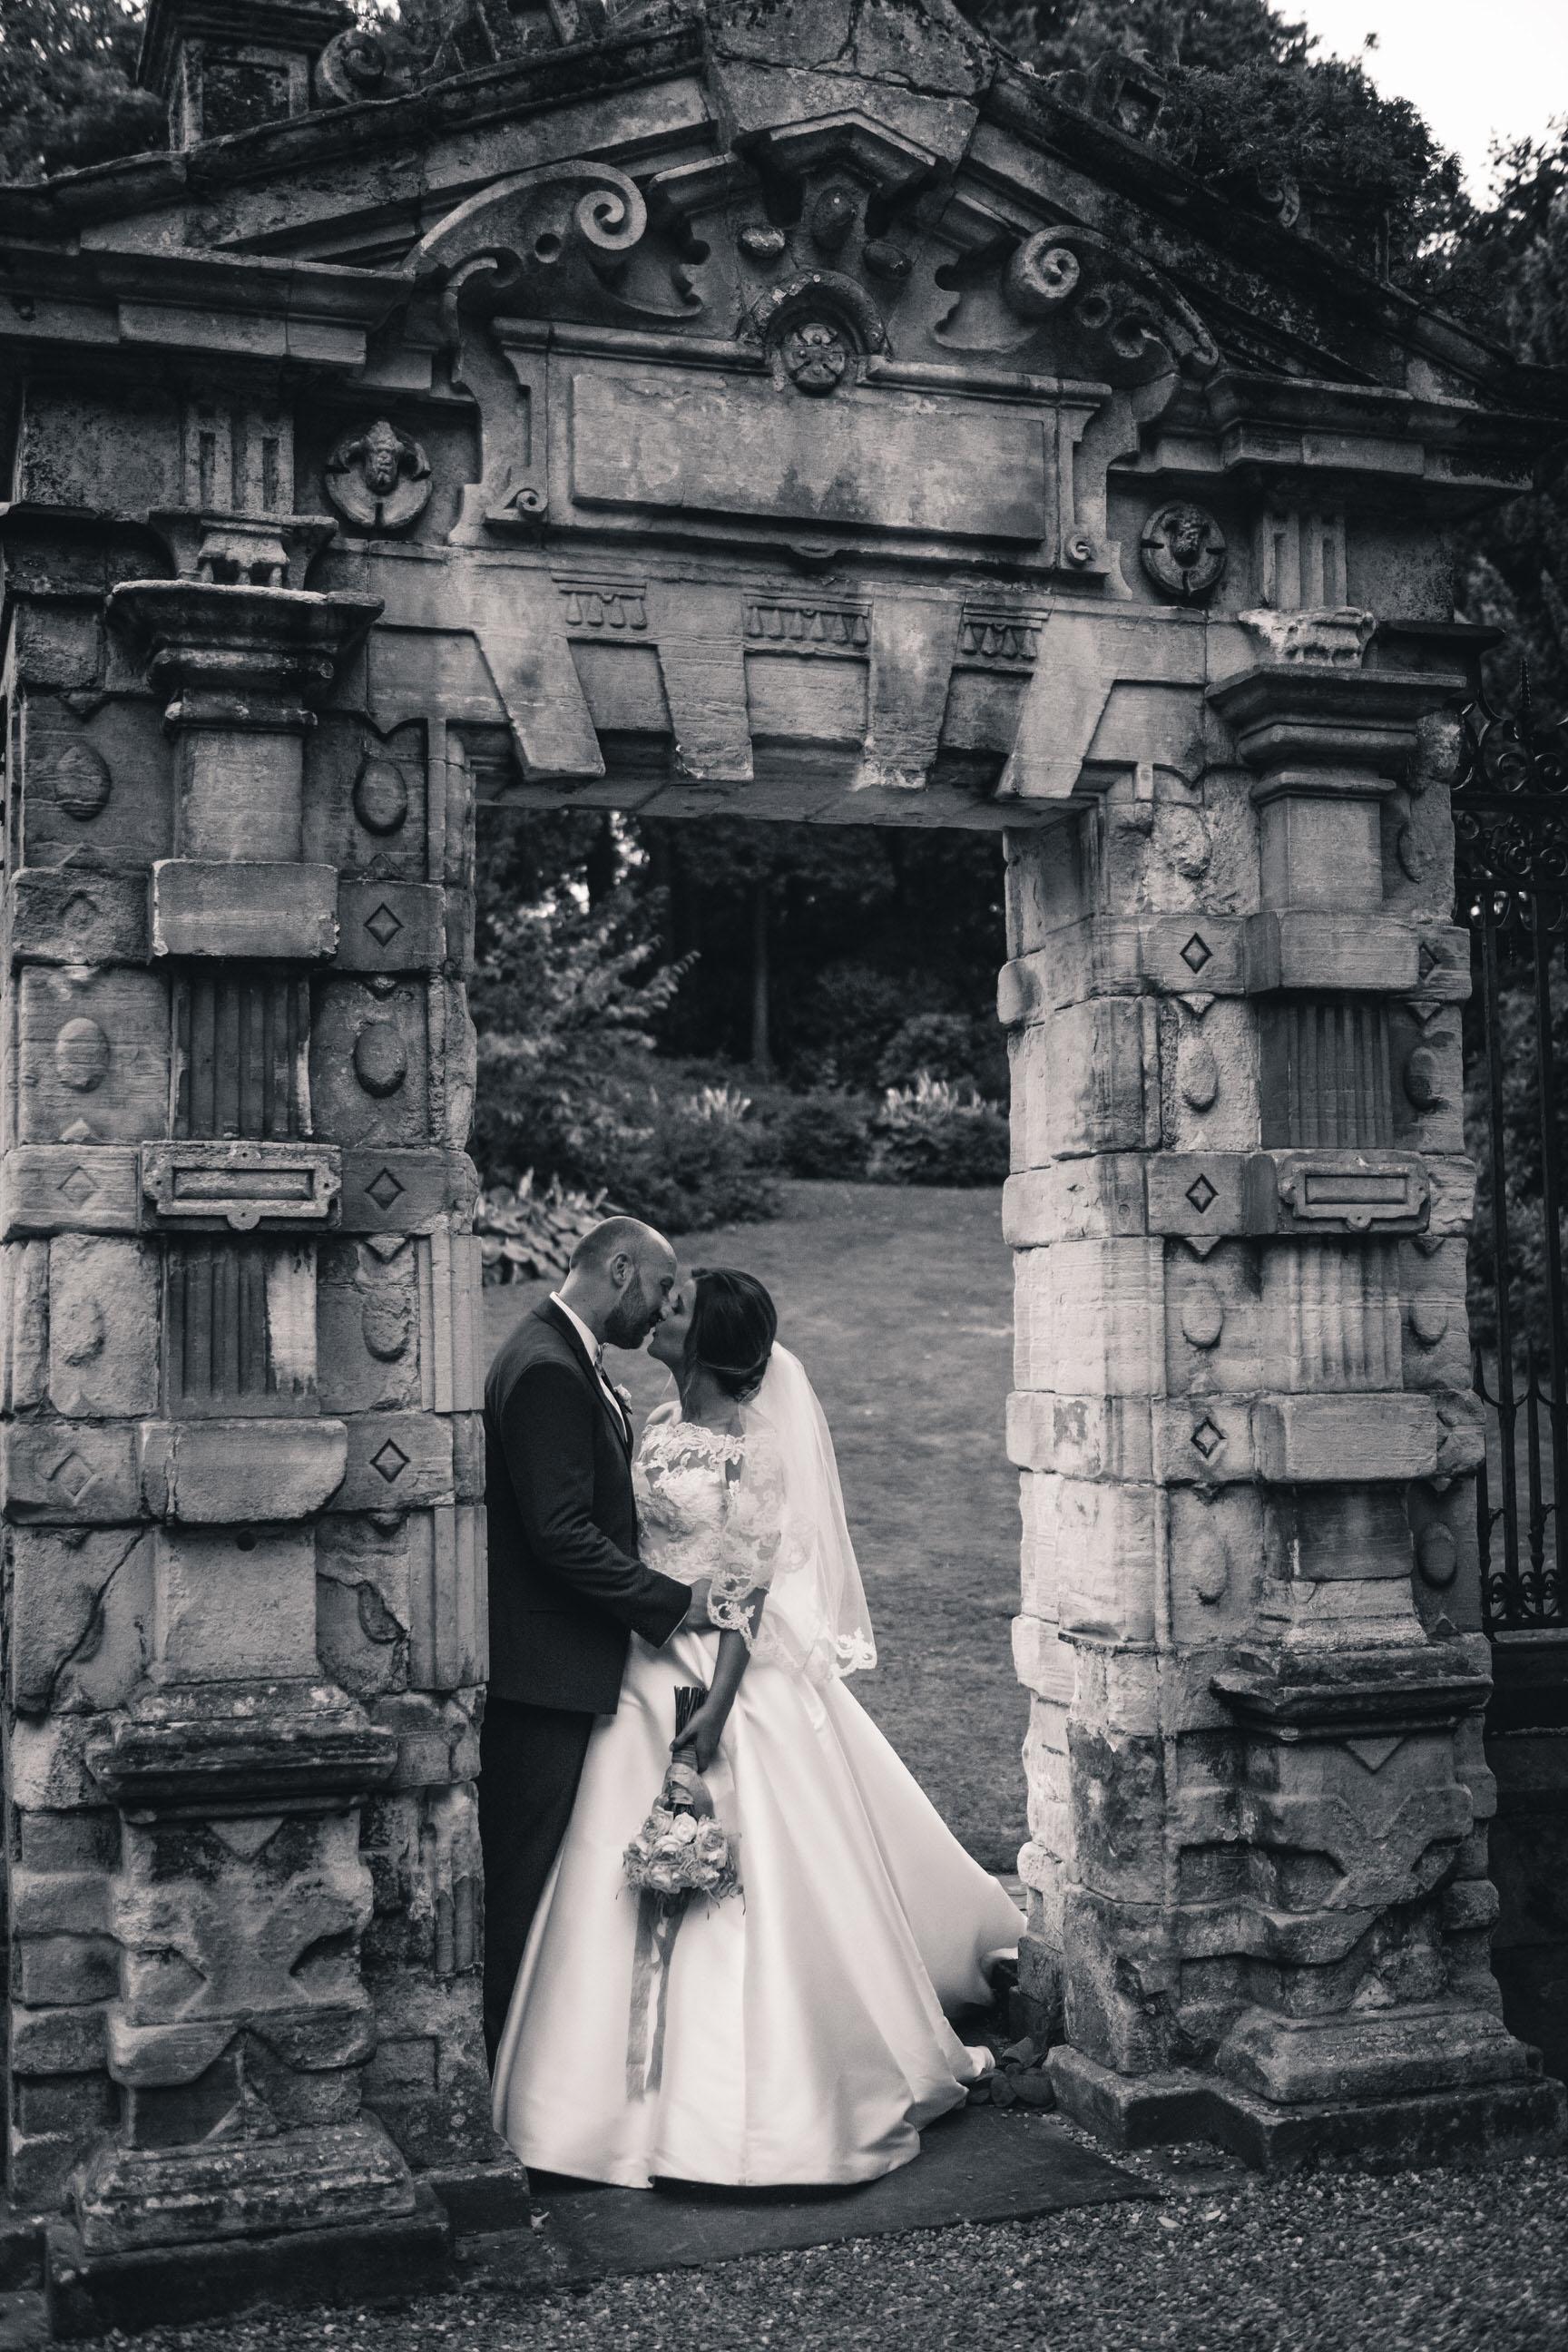 wentworth-woodhous-yorkshire-wedding-photographer-119.jpg